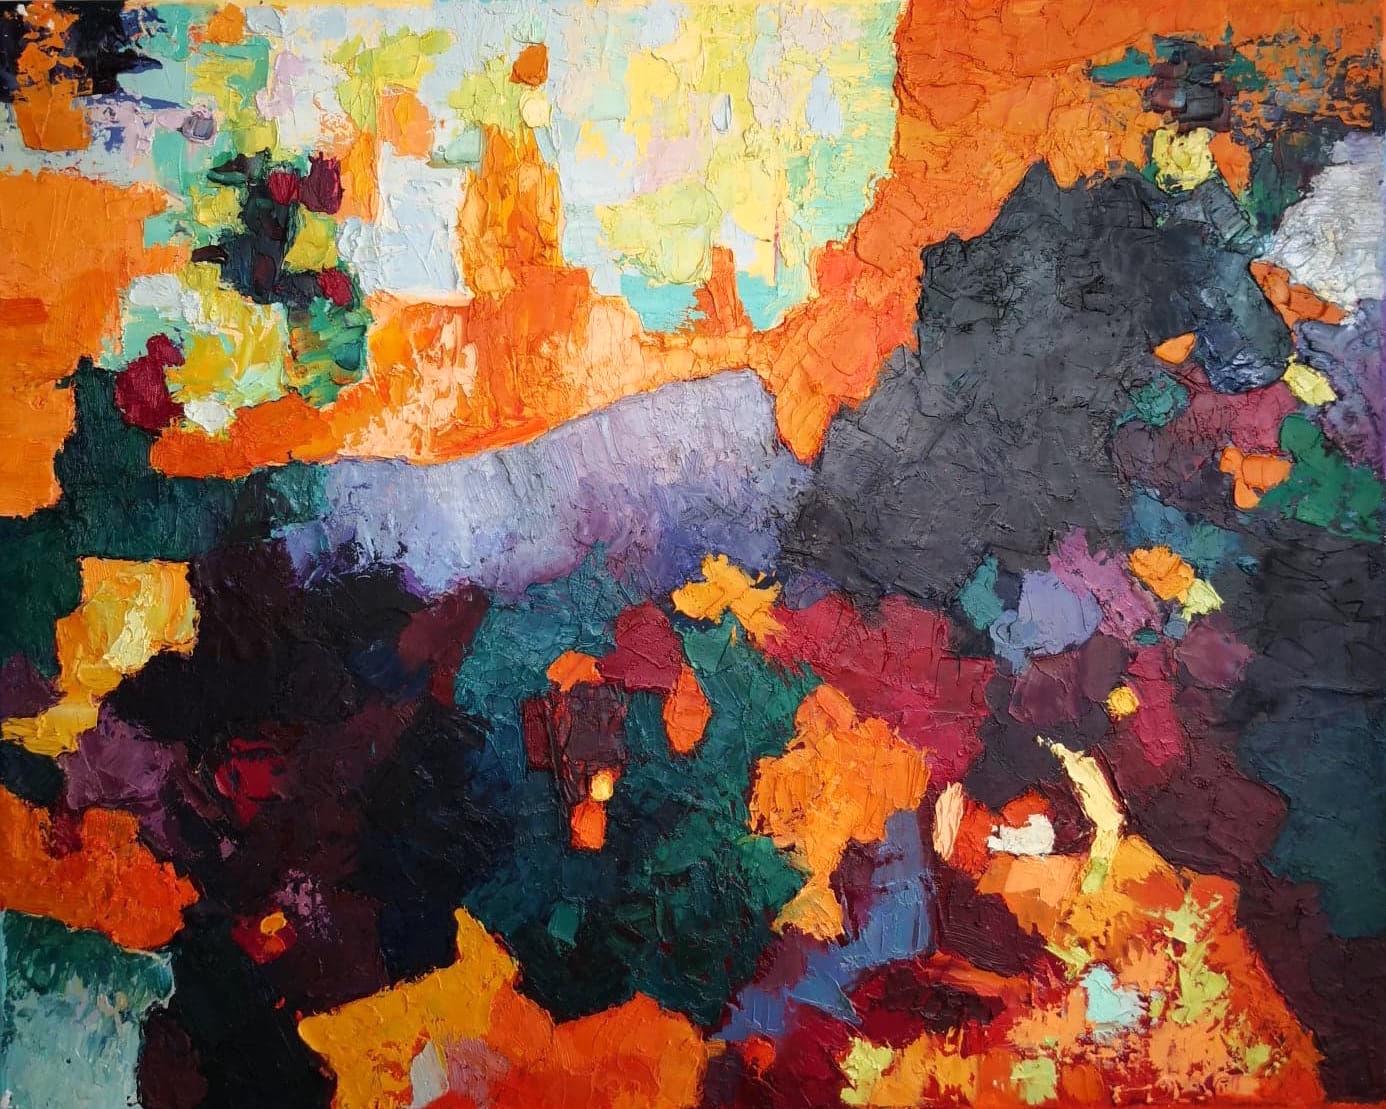 Heather M. Johnson, Bridge, Oil on canvas, 16x20inches, $325.jpg